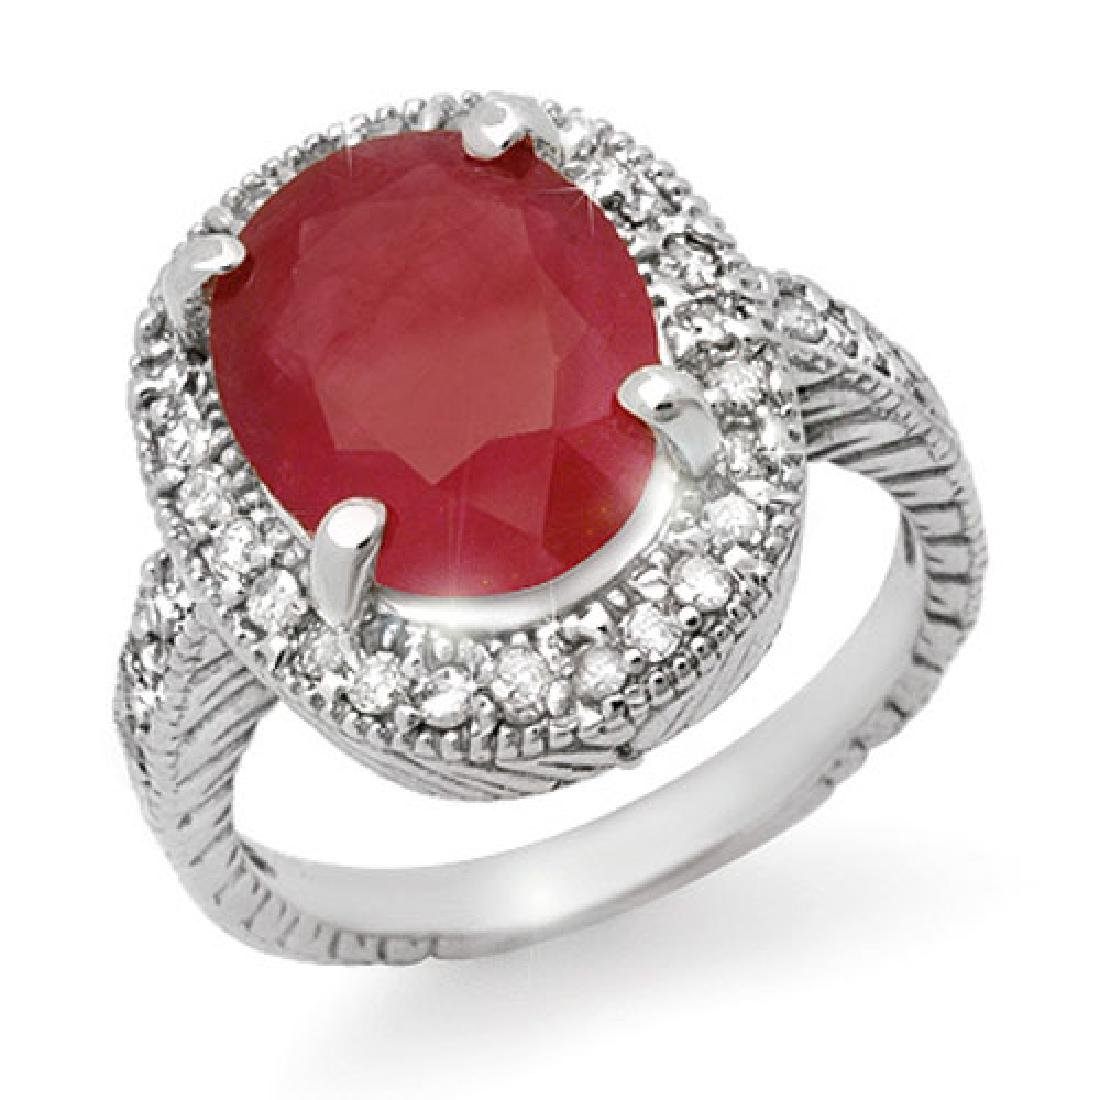 8.0 CTW Ruby & Diamond Ring 14K White Gold